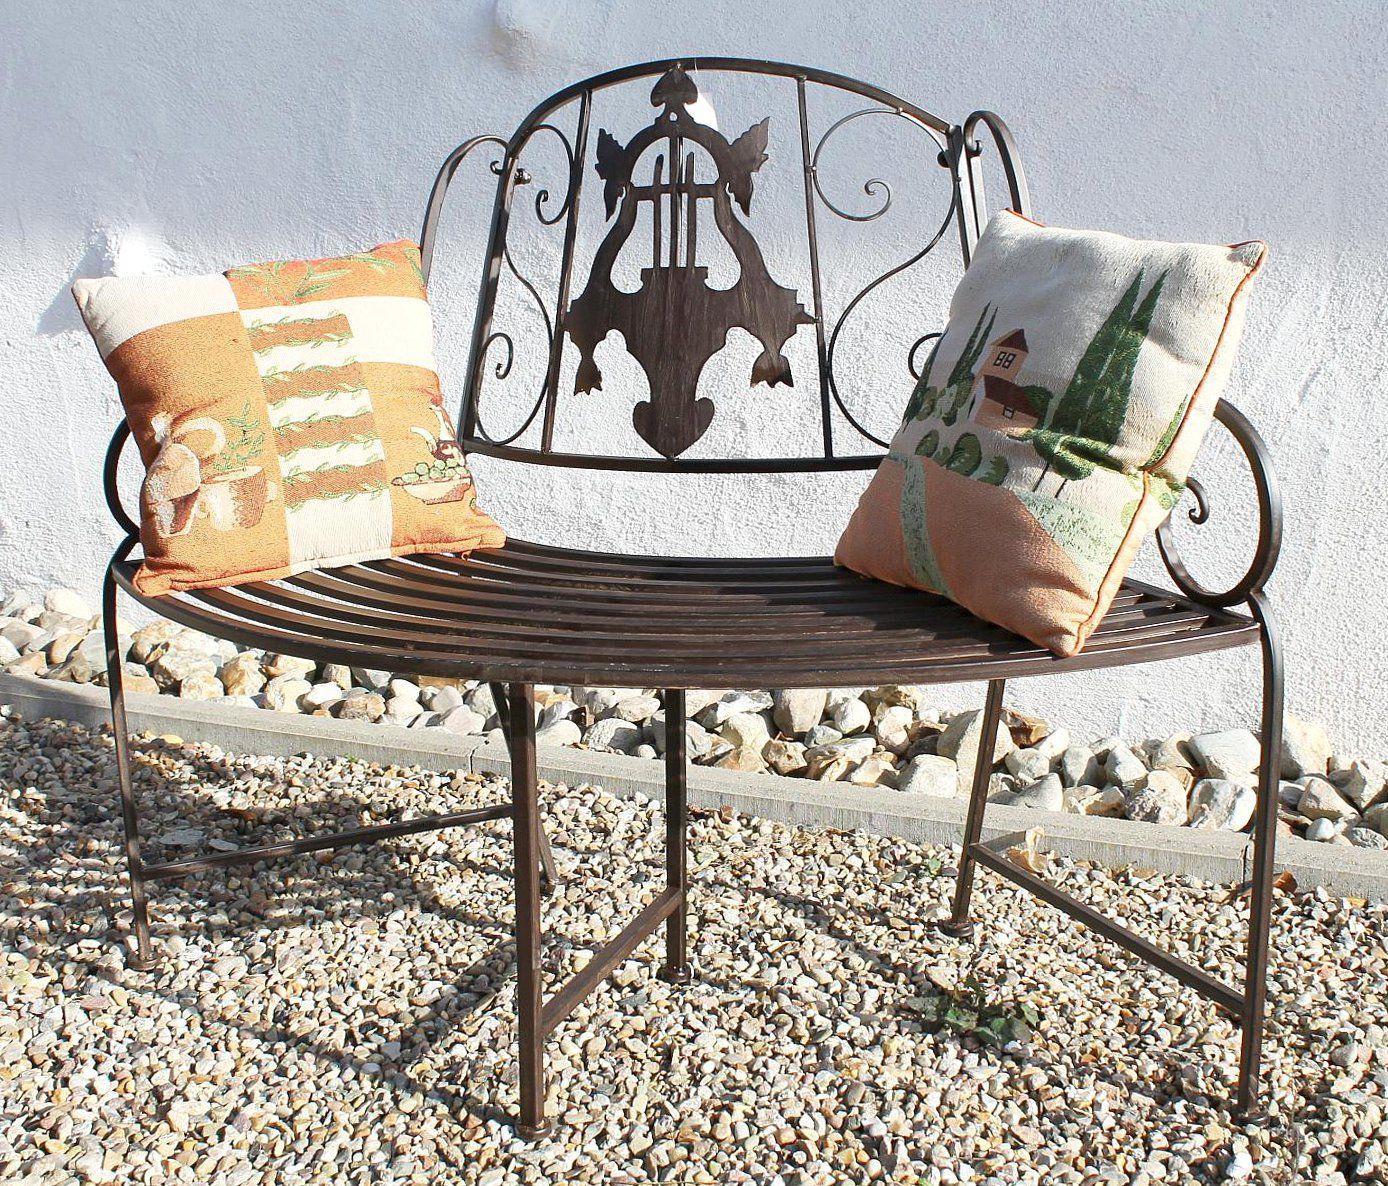 bank jd130838 aus metall gartenbank sitzbank baumbank 2. Black Bedroom Furniture Sets. Home Design Ideas